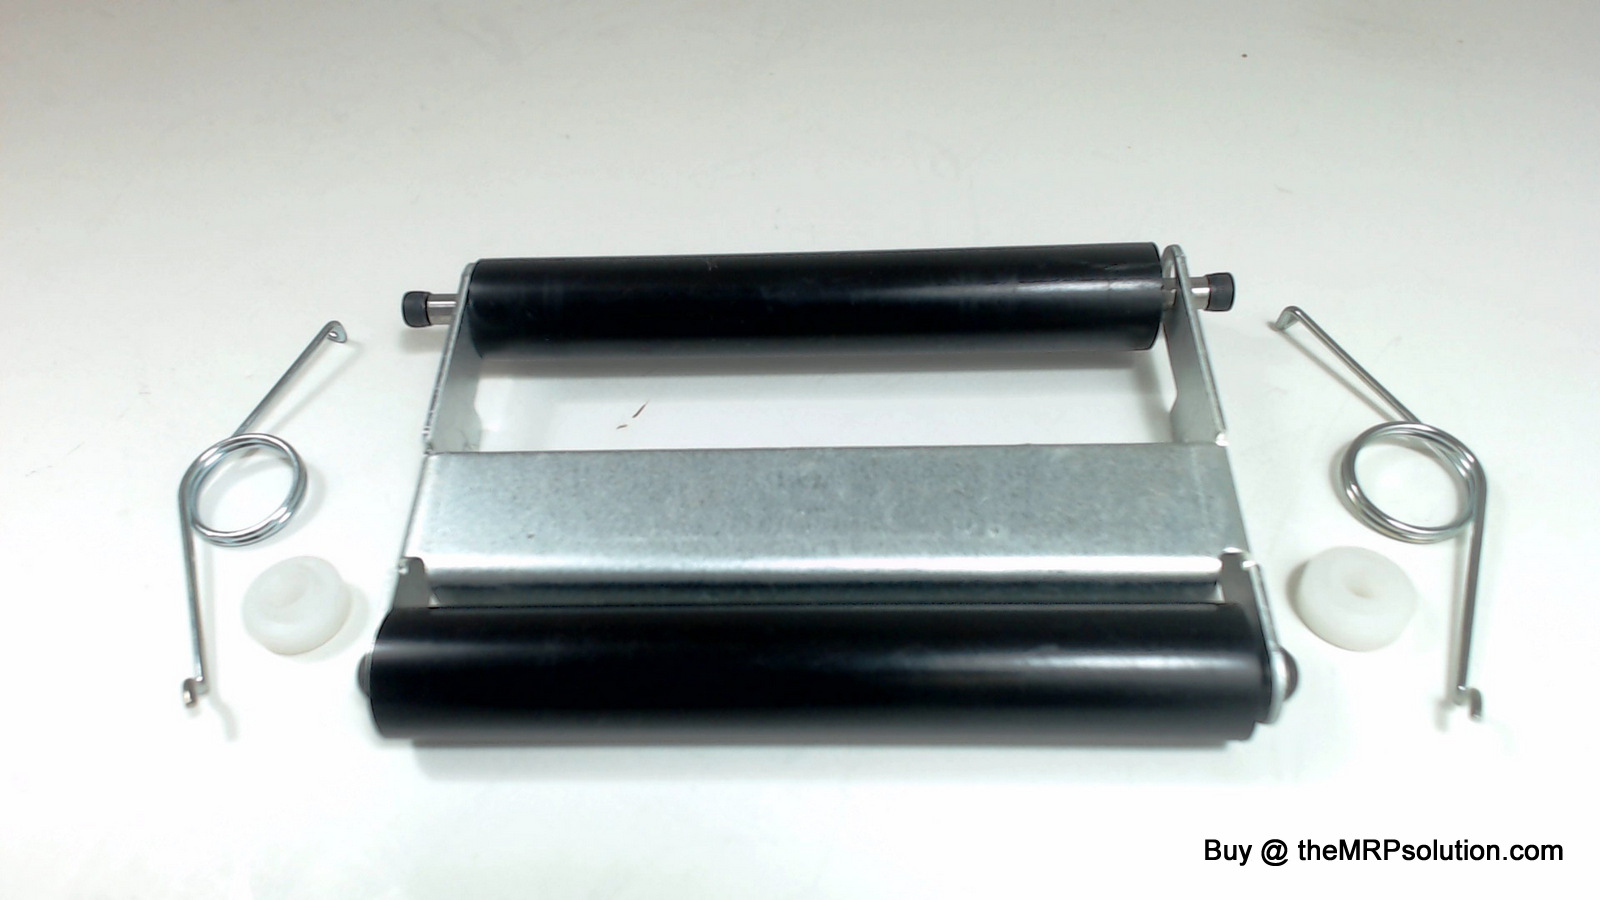 ZEBRA 46691-1M DANCER ARM ASSY, 90XI III Refurbished